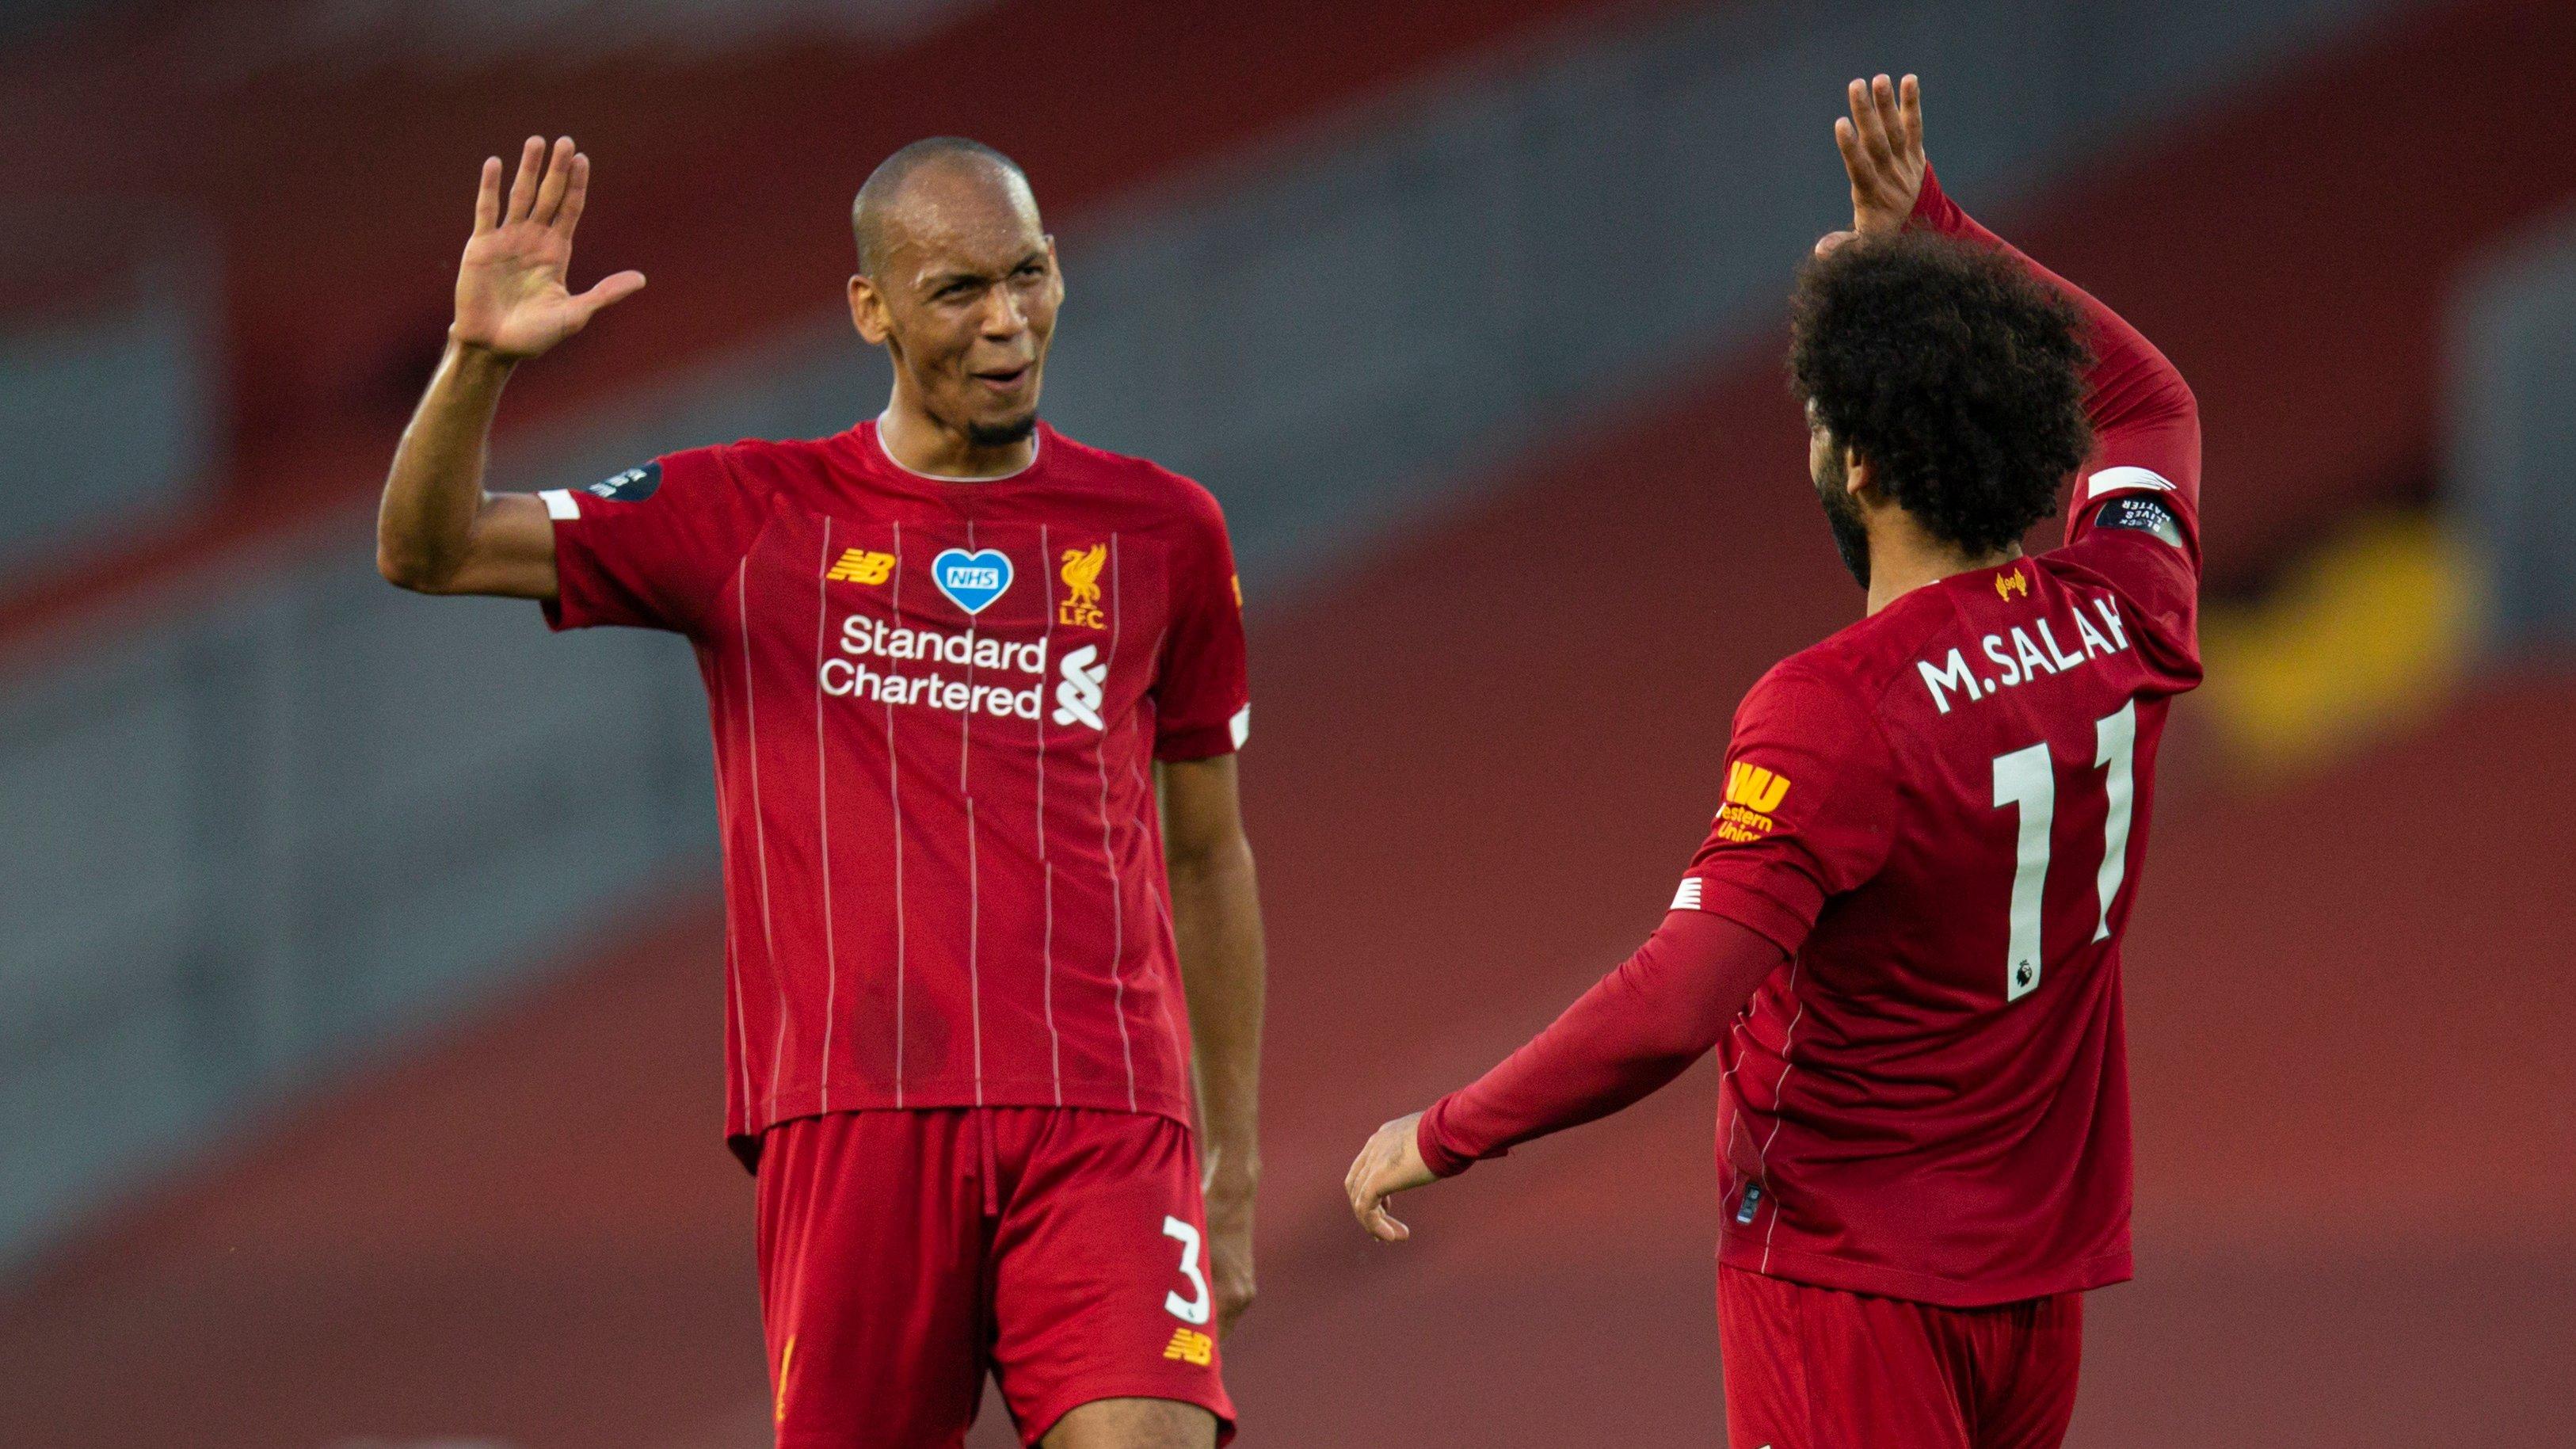 El Liverpool ya está ahí